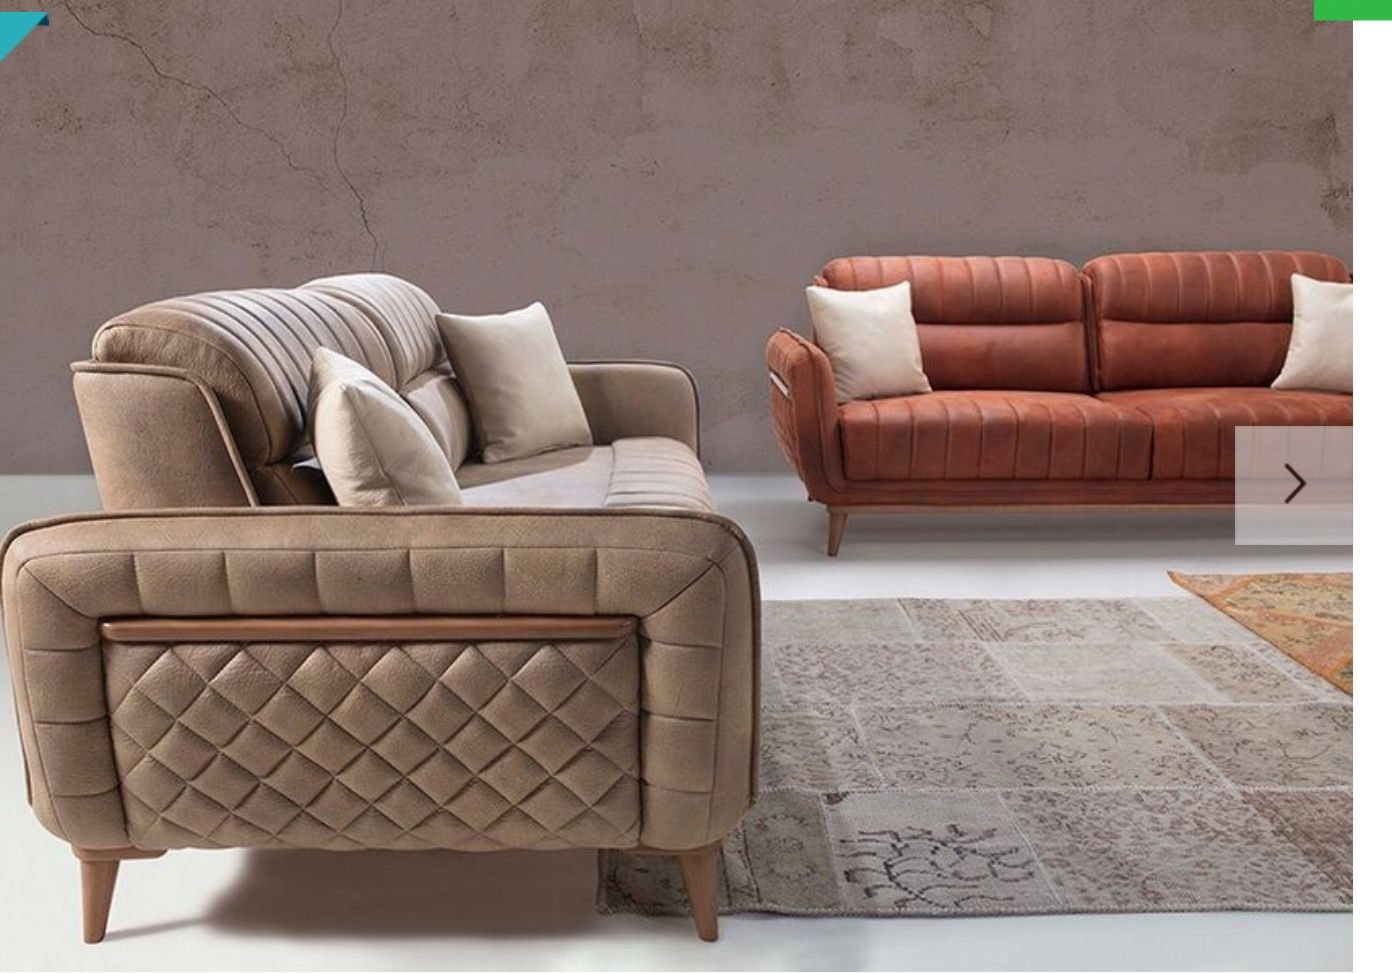 Bonjour 2 Luxury Sofa Design Living Room Sofa Design Sofa Design